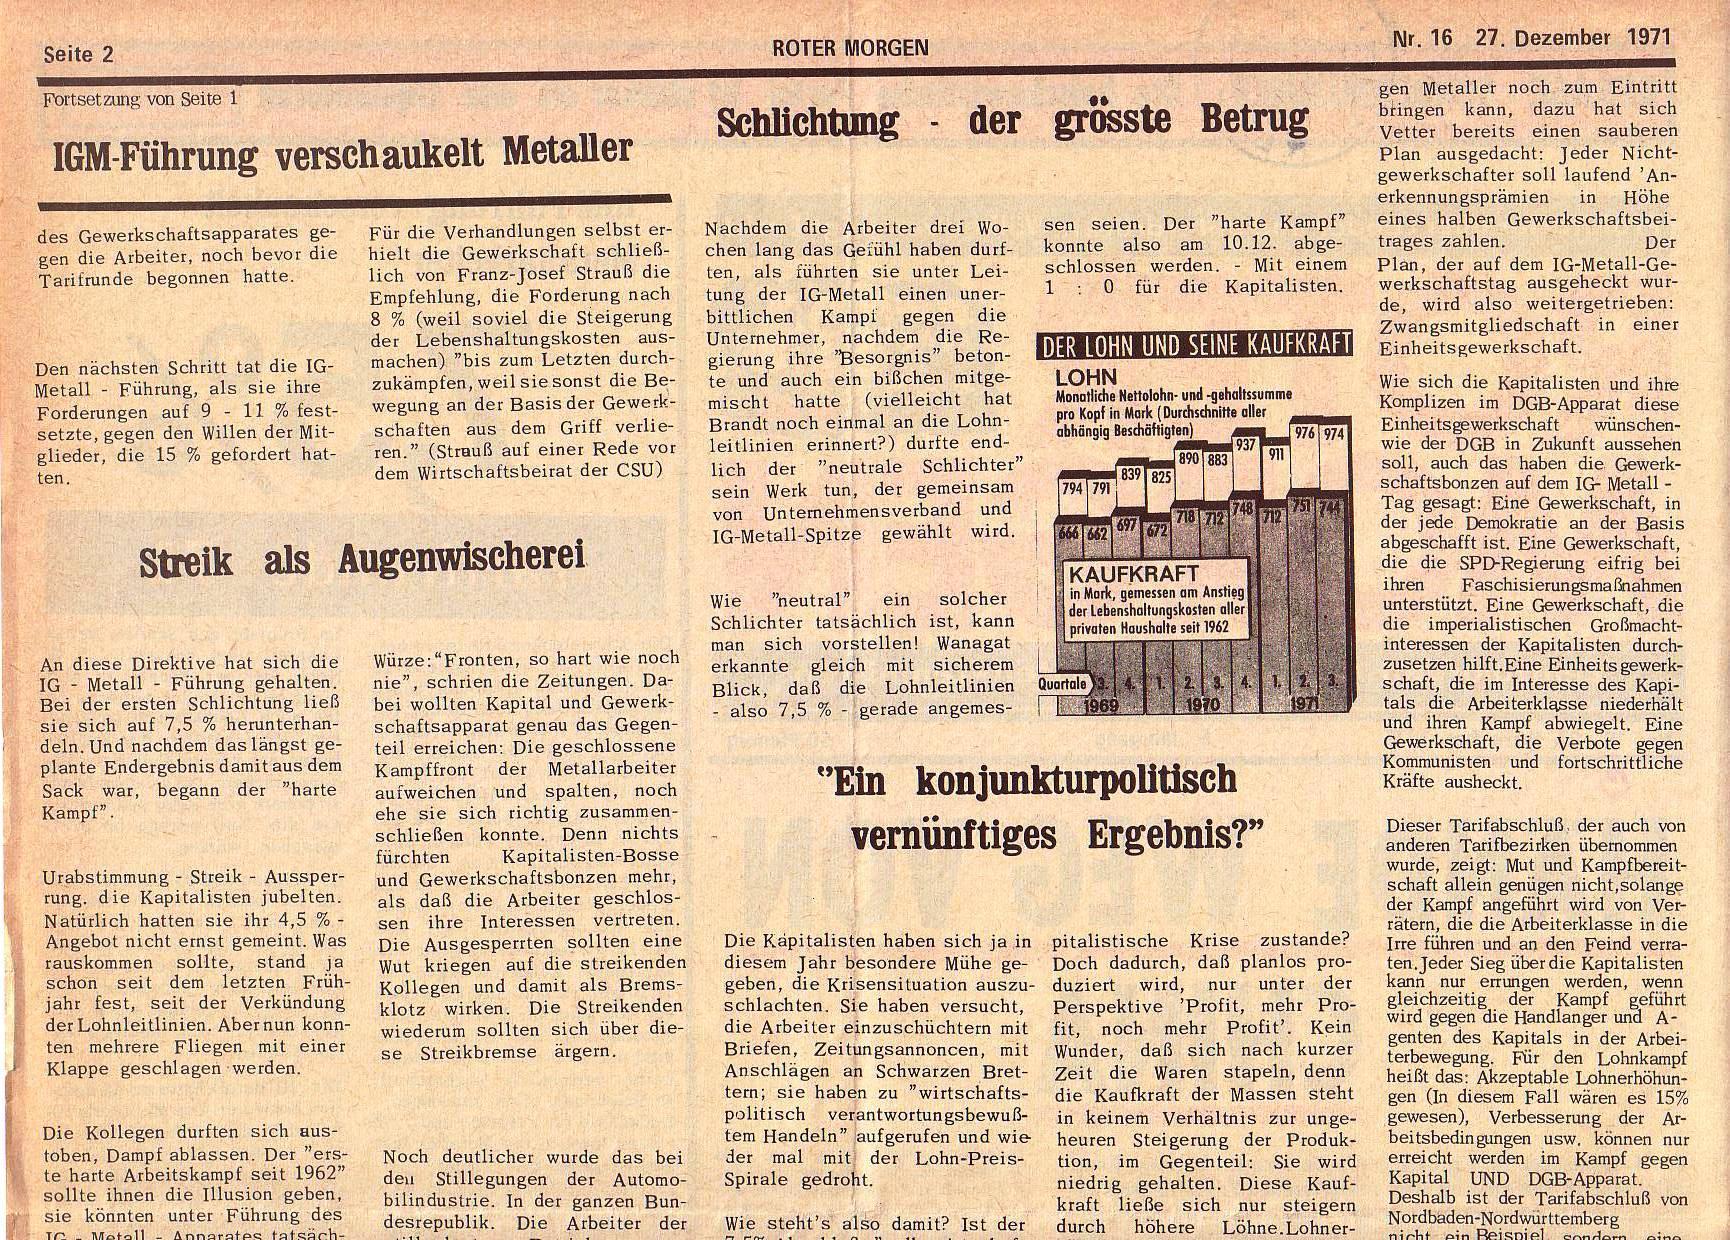 Roter Morgen, 5. Jg., 27. Dezember 1971, Nr. 16, Seite 2a